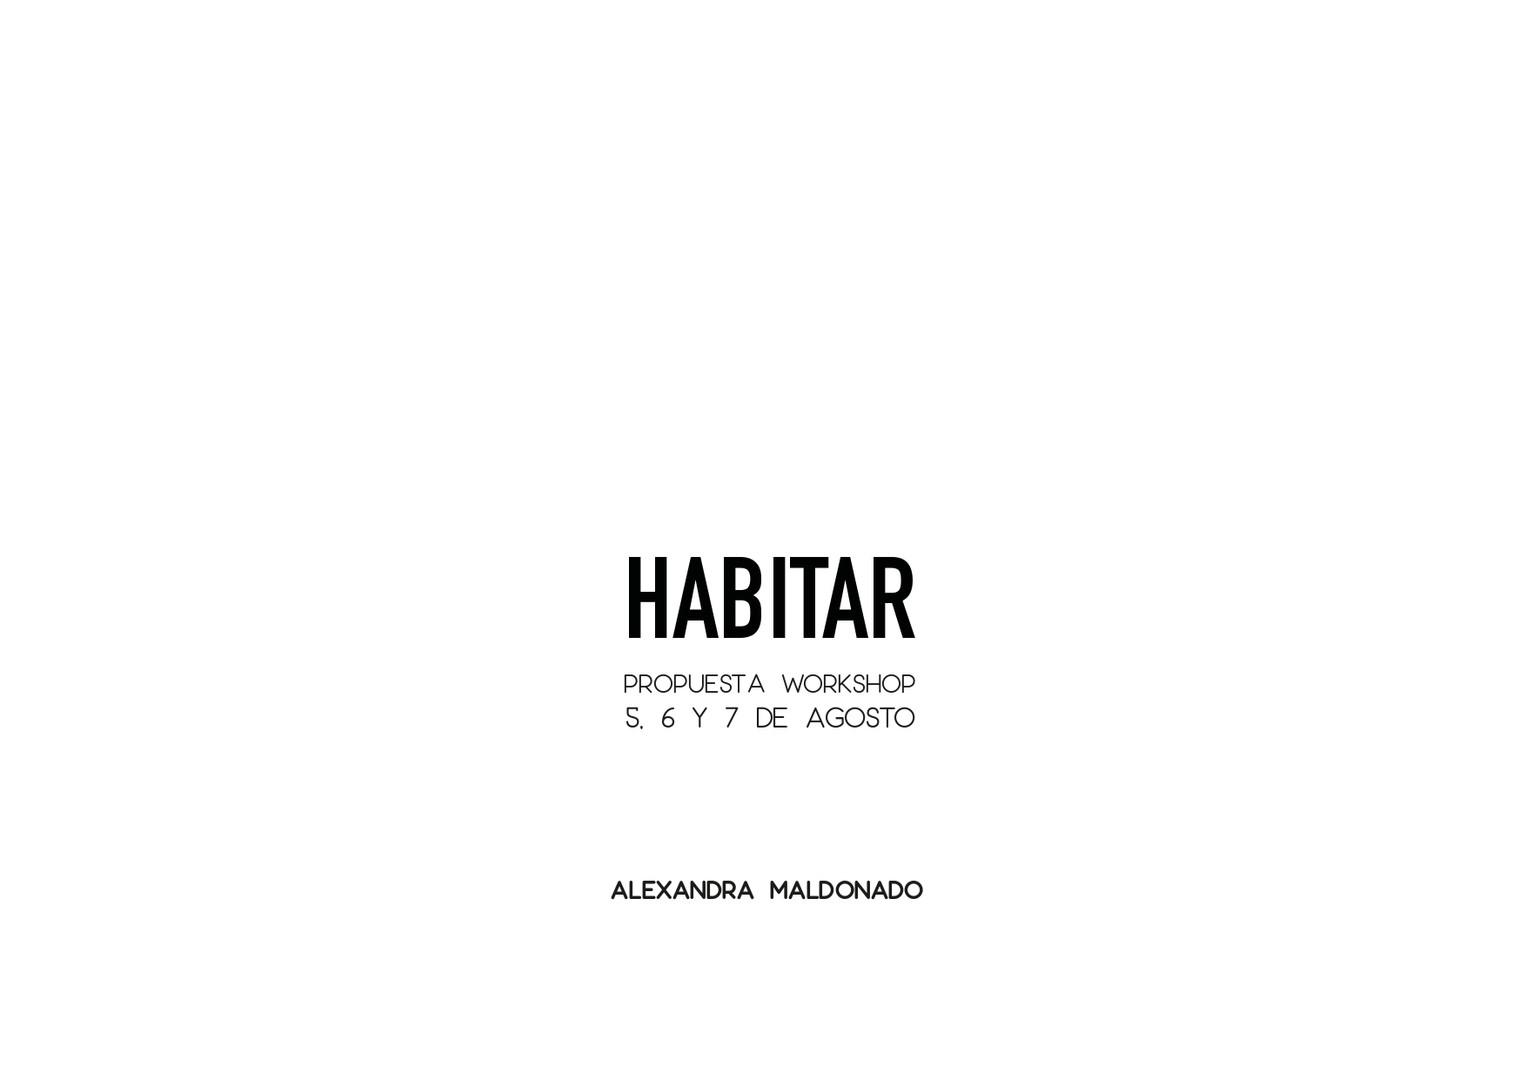 Habitar - Fotografía Documen1